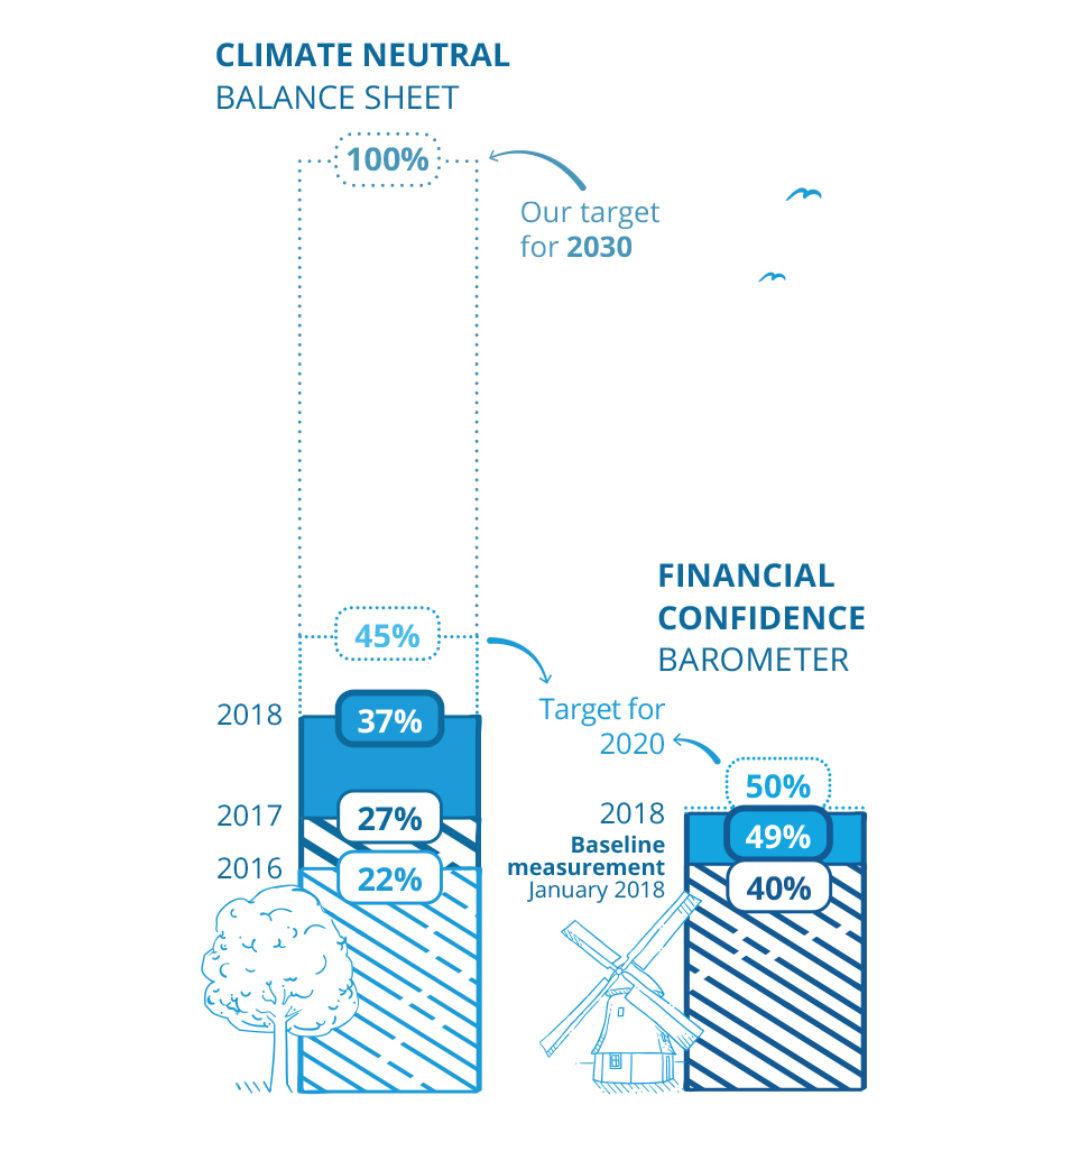 Climate Neutral Balance Sheeyt